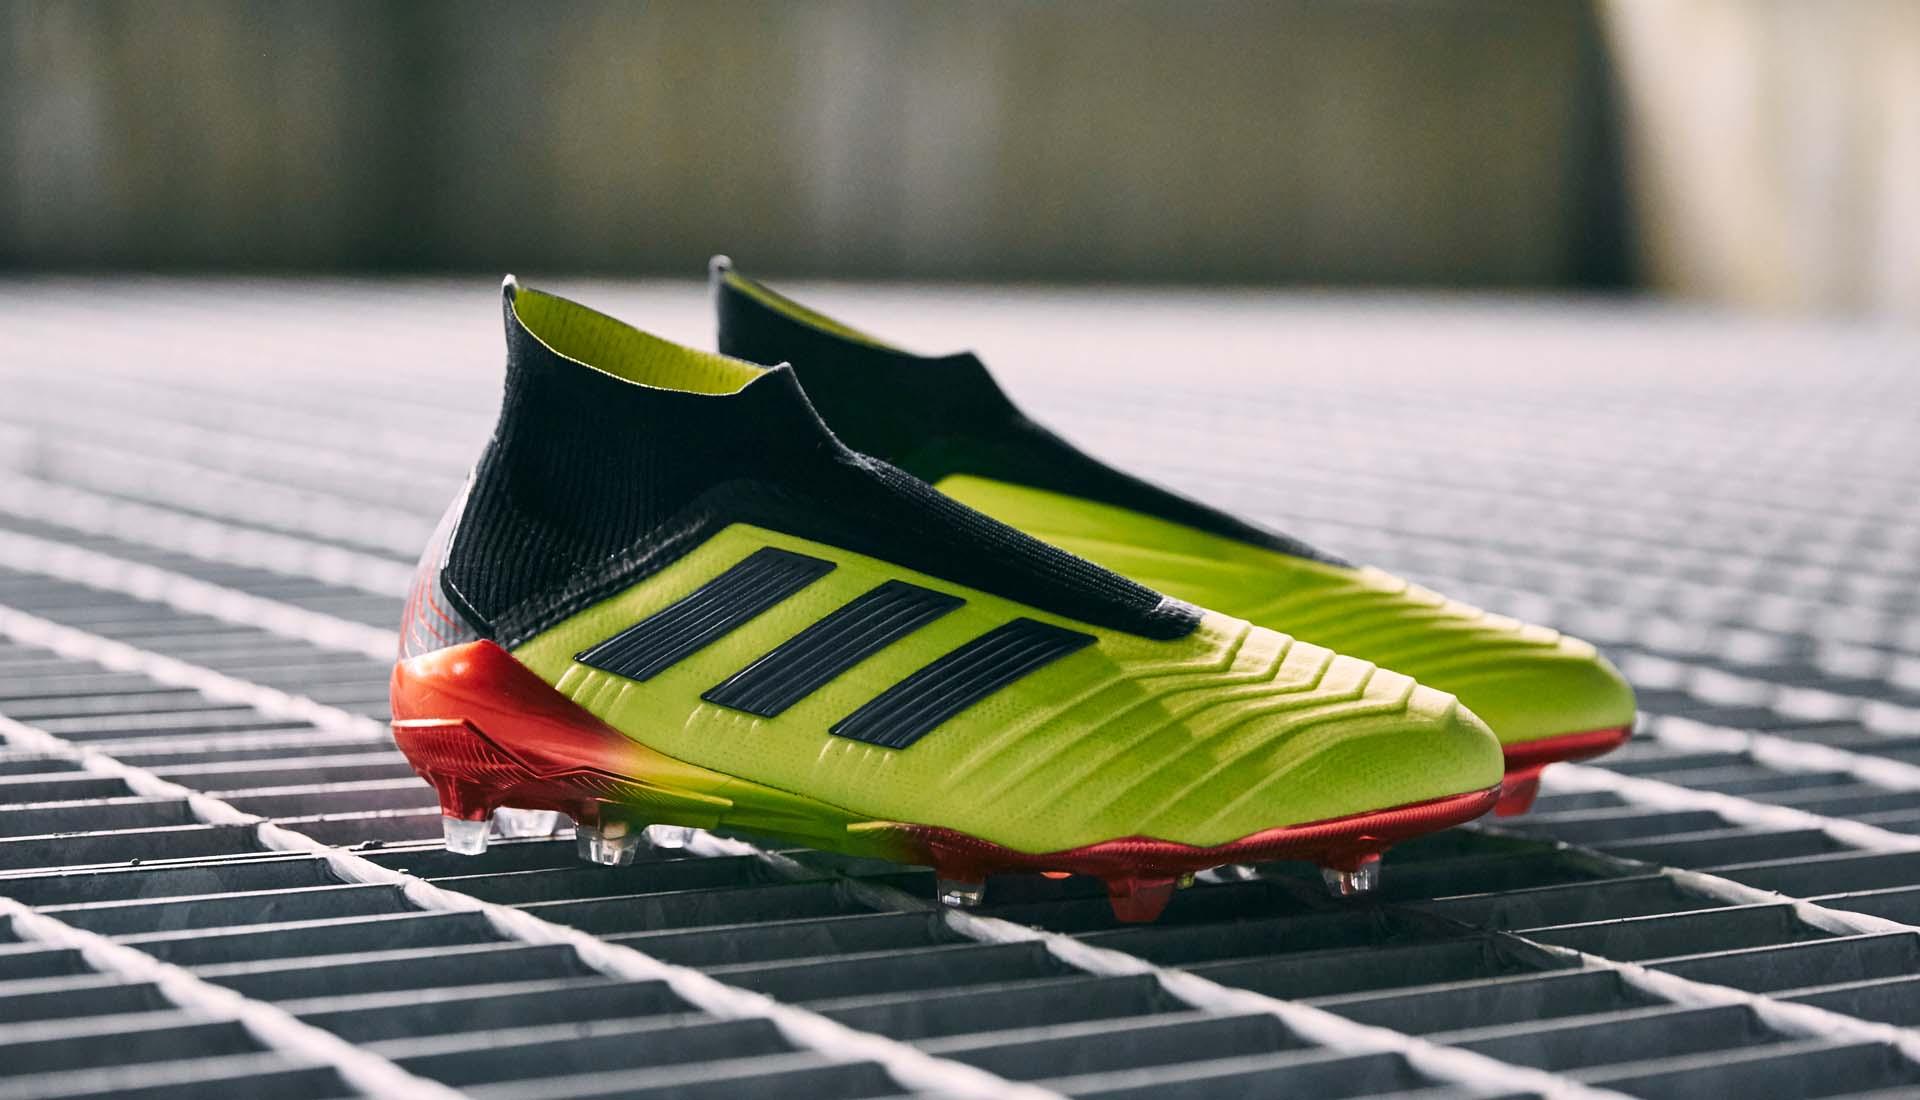 adidas Launch The Predator 18+